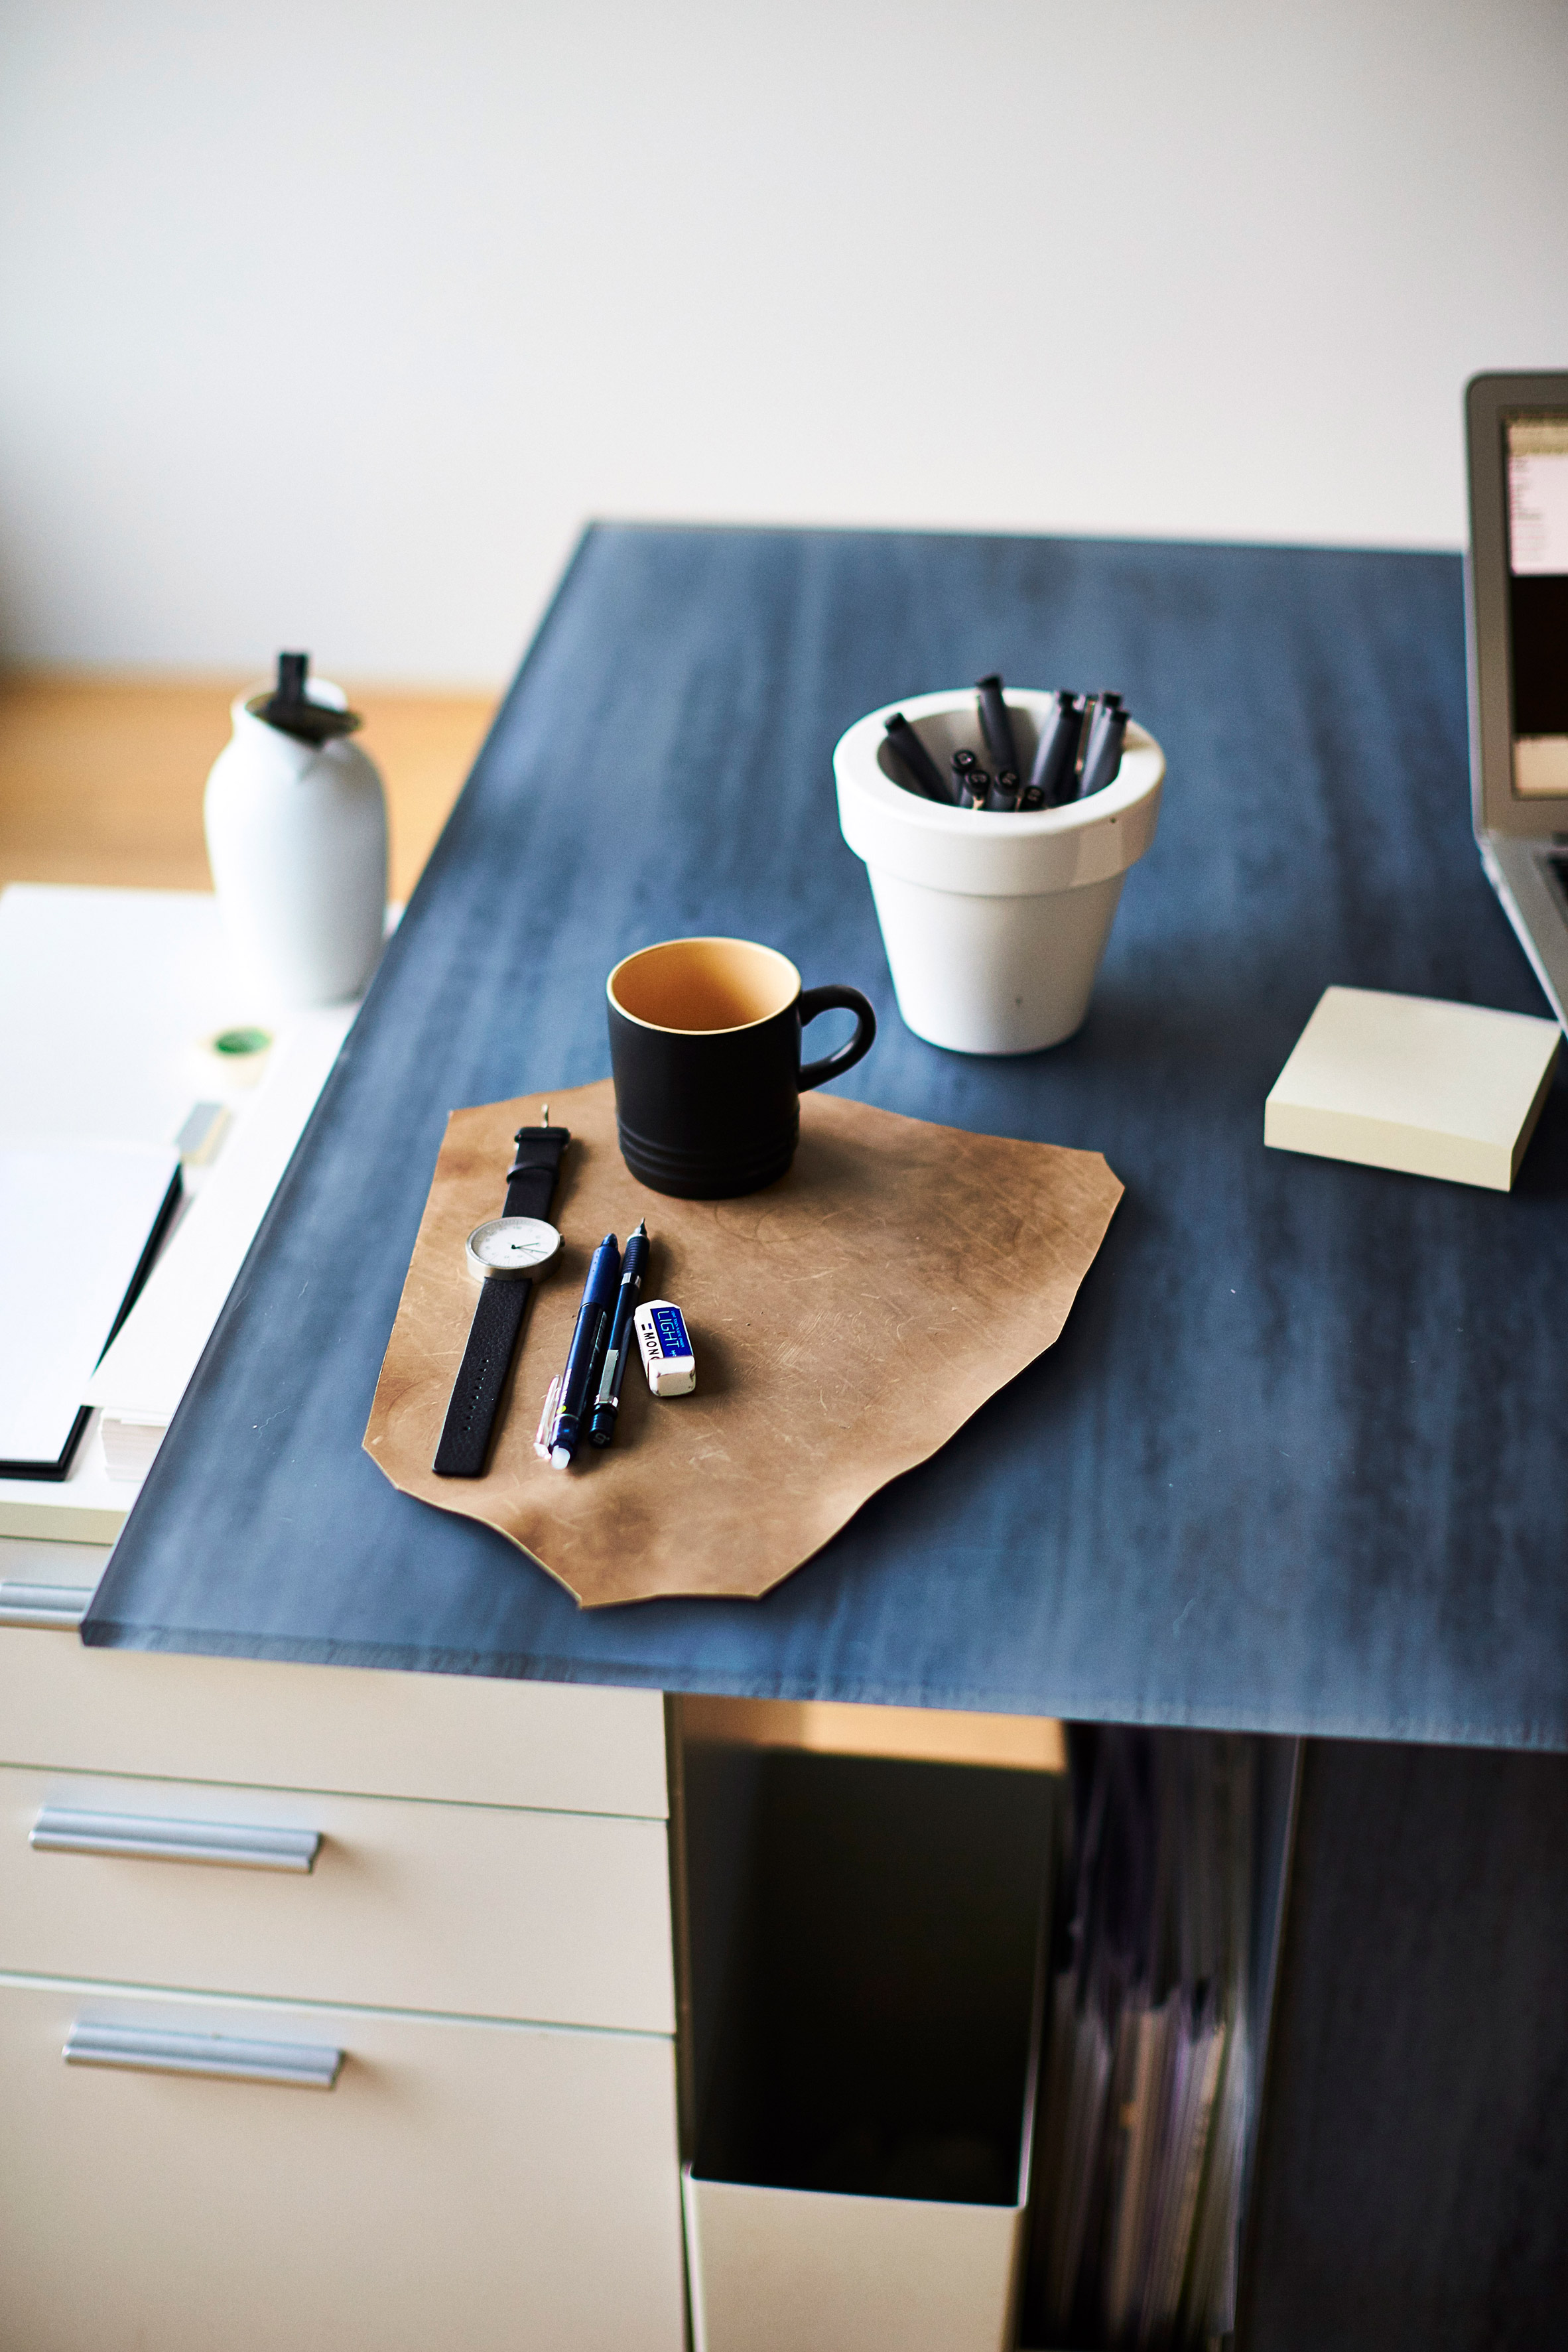 Nendo's office